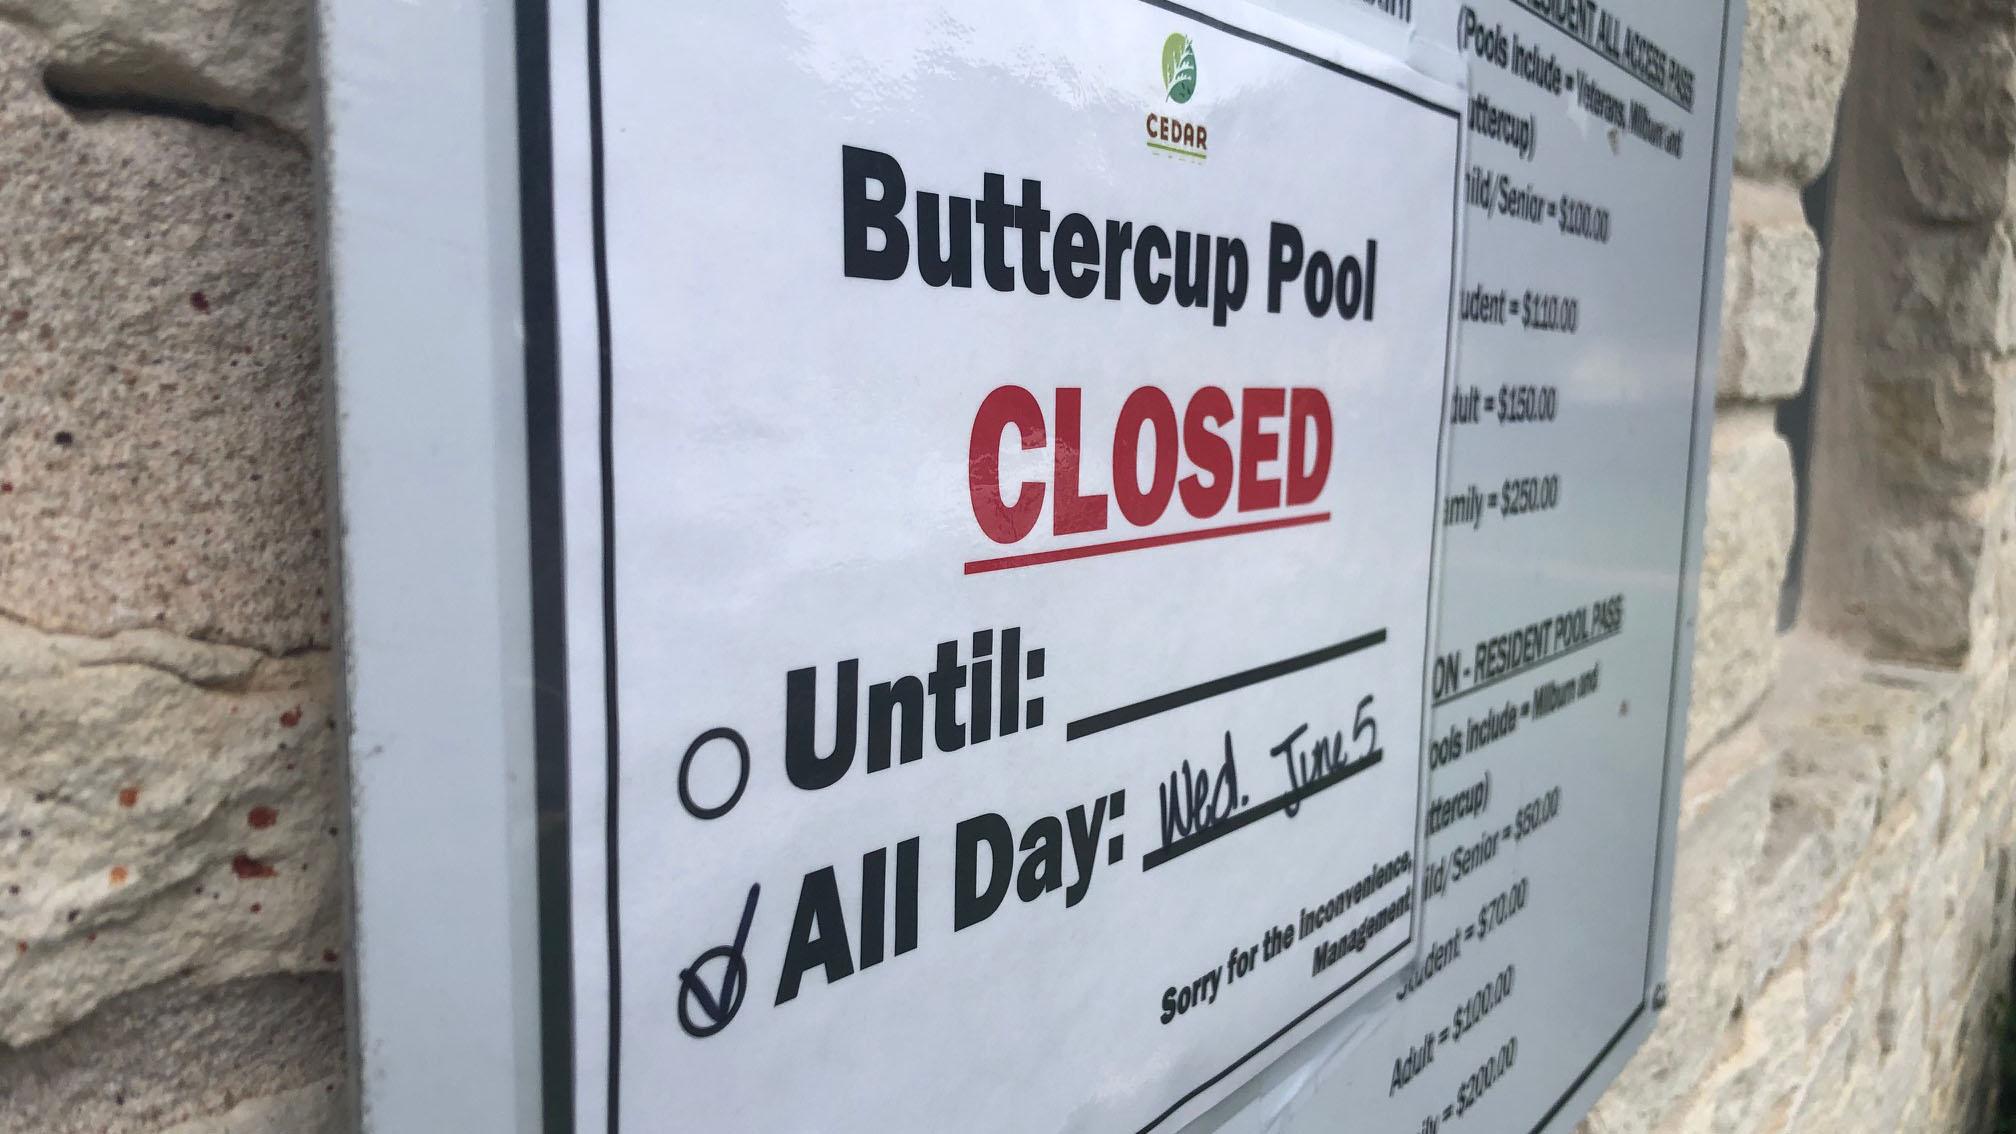 buttercup pool closed sign 652019_1559749619141.jpg.jpg